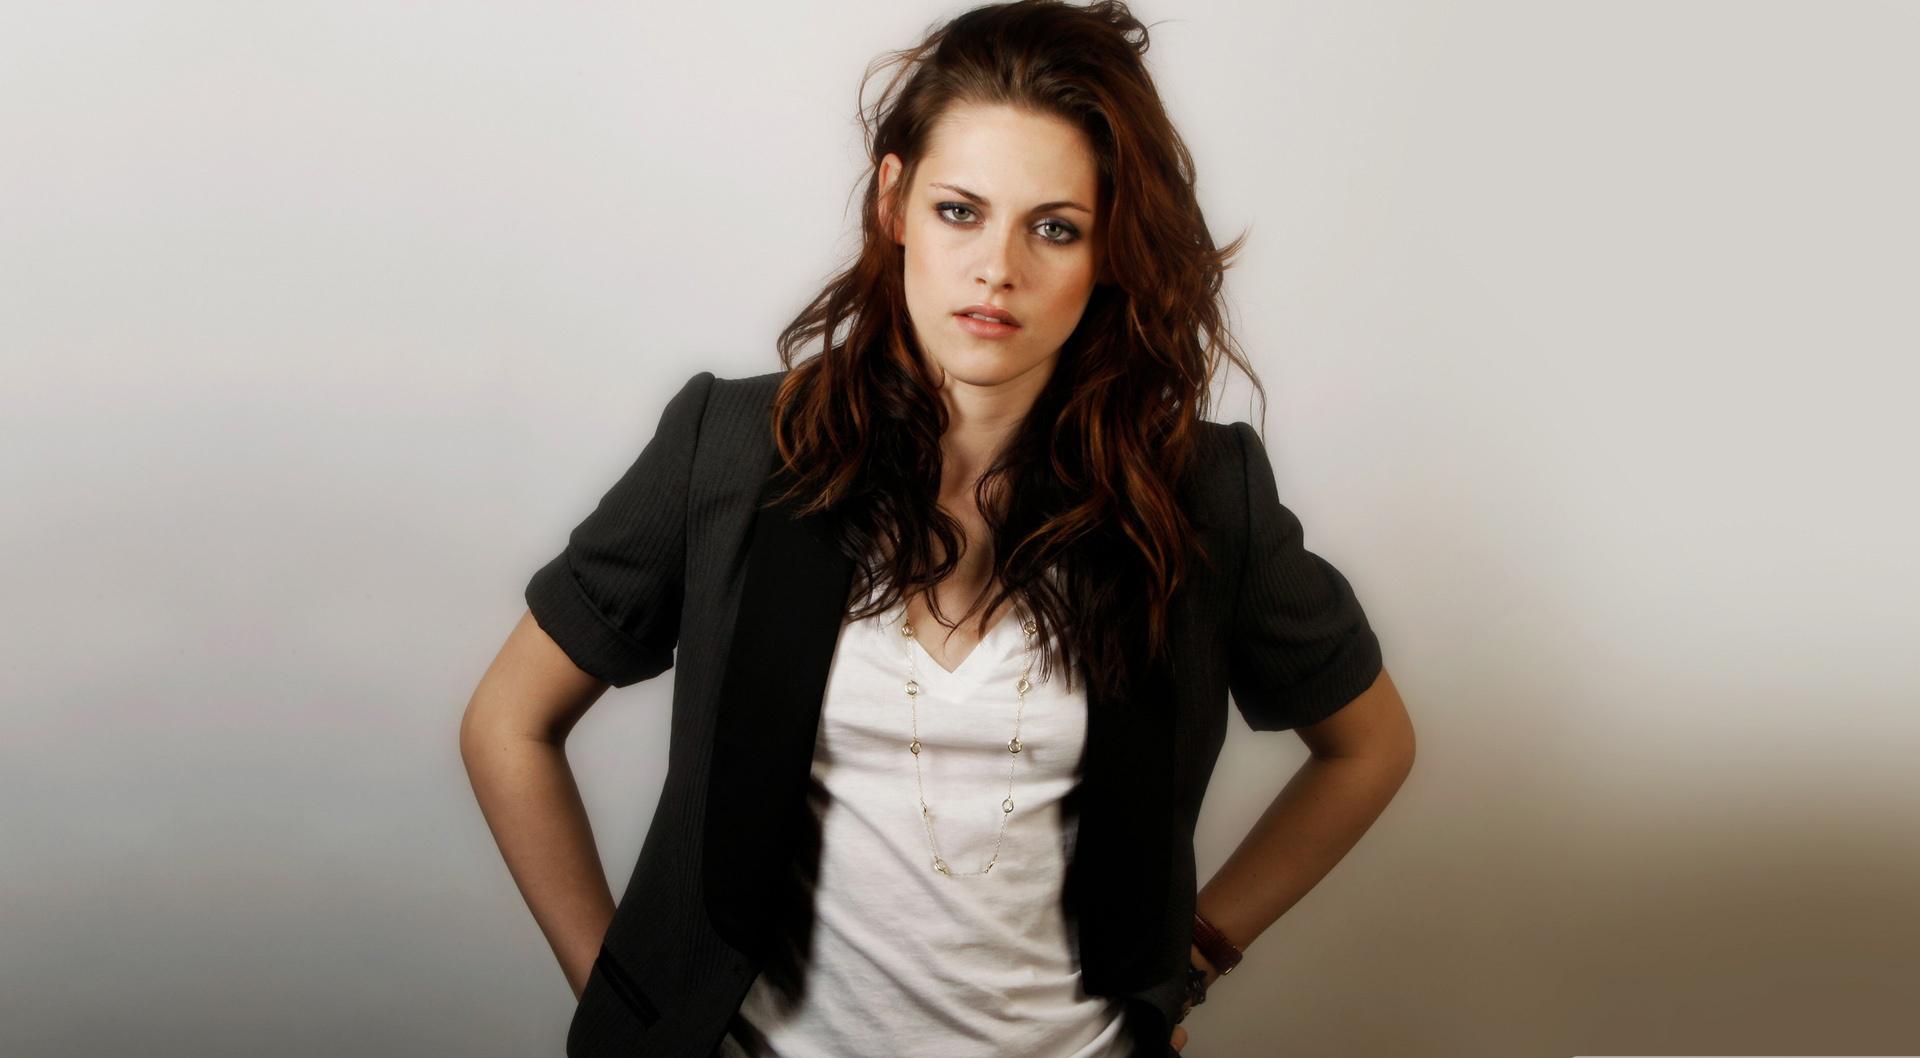 Top TV Shows, Recaps, New Movies, Entertainment Kristen stewart latest photo shoot